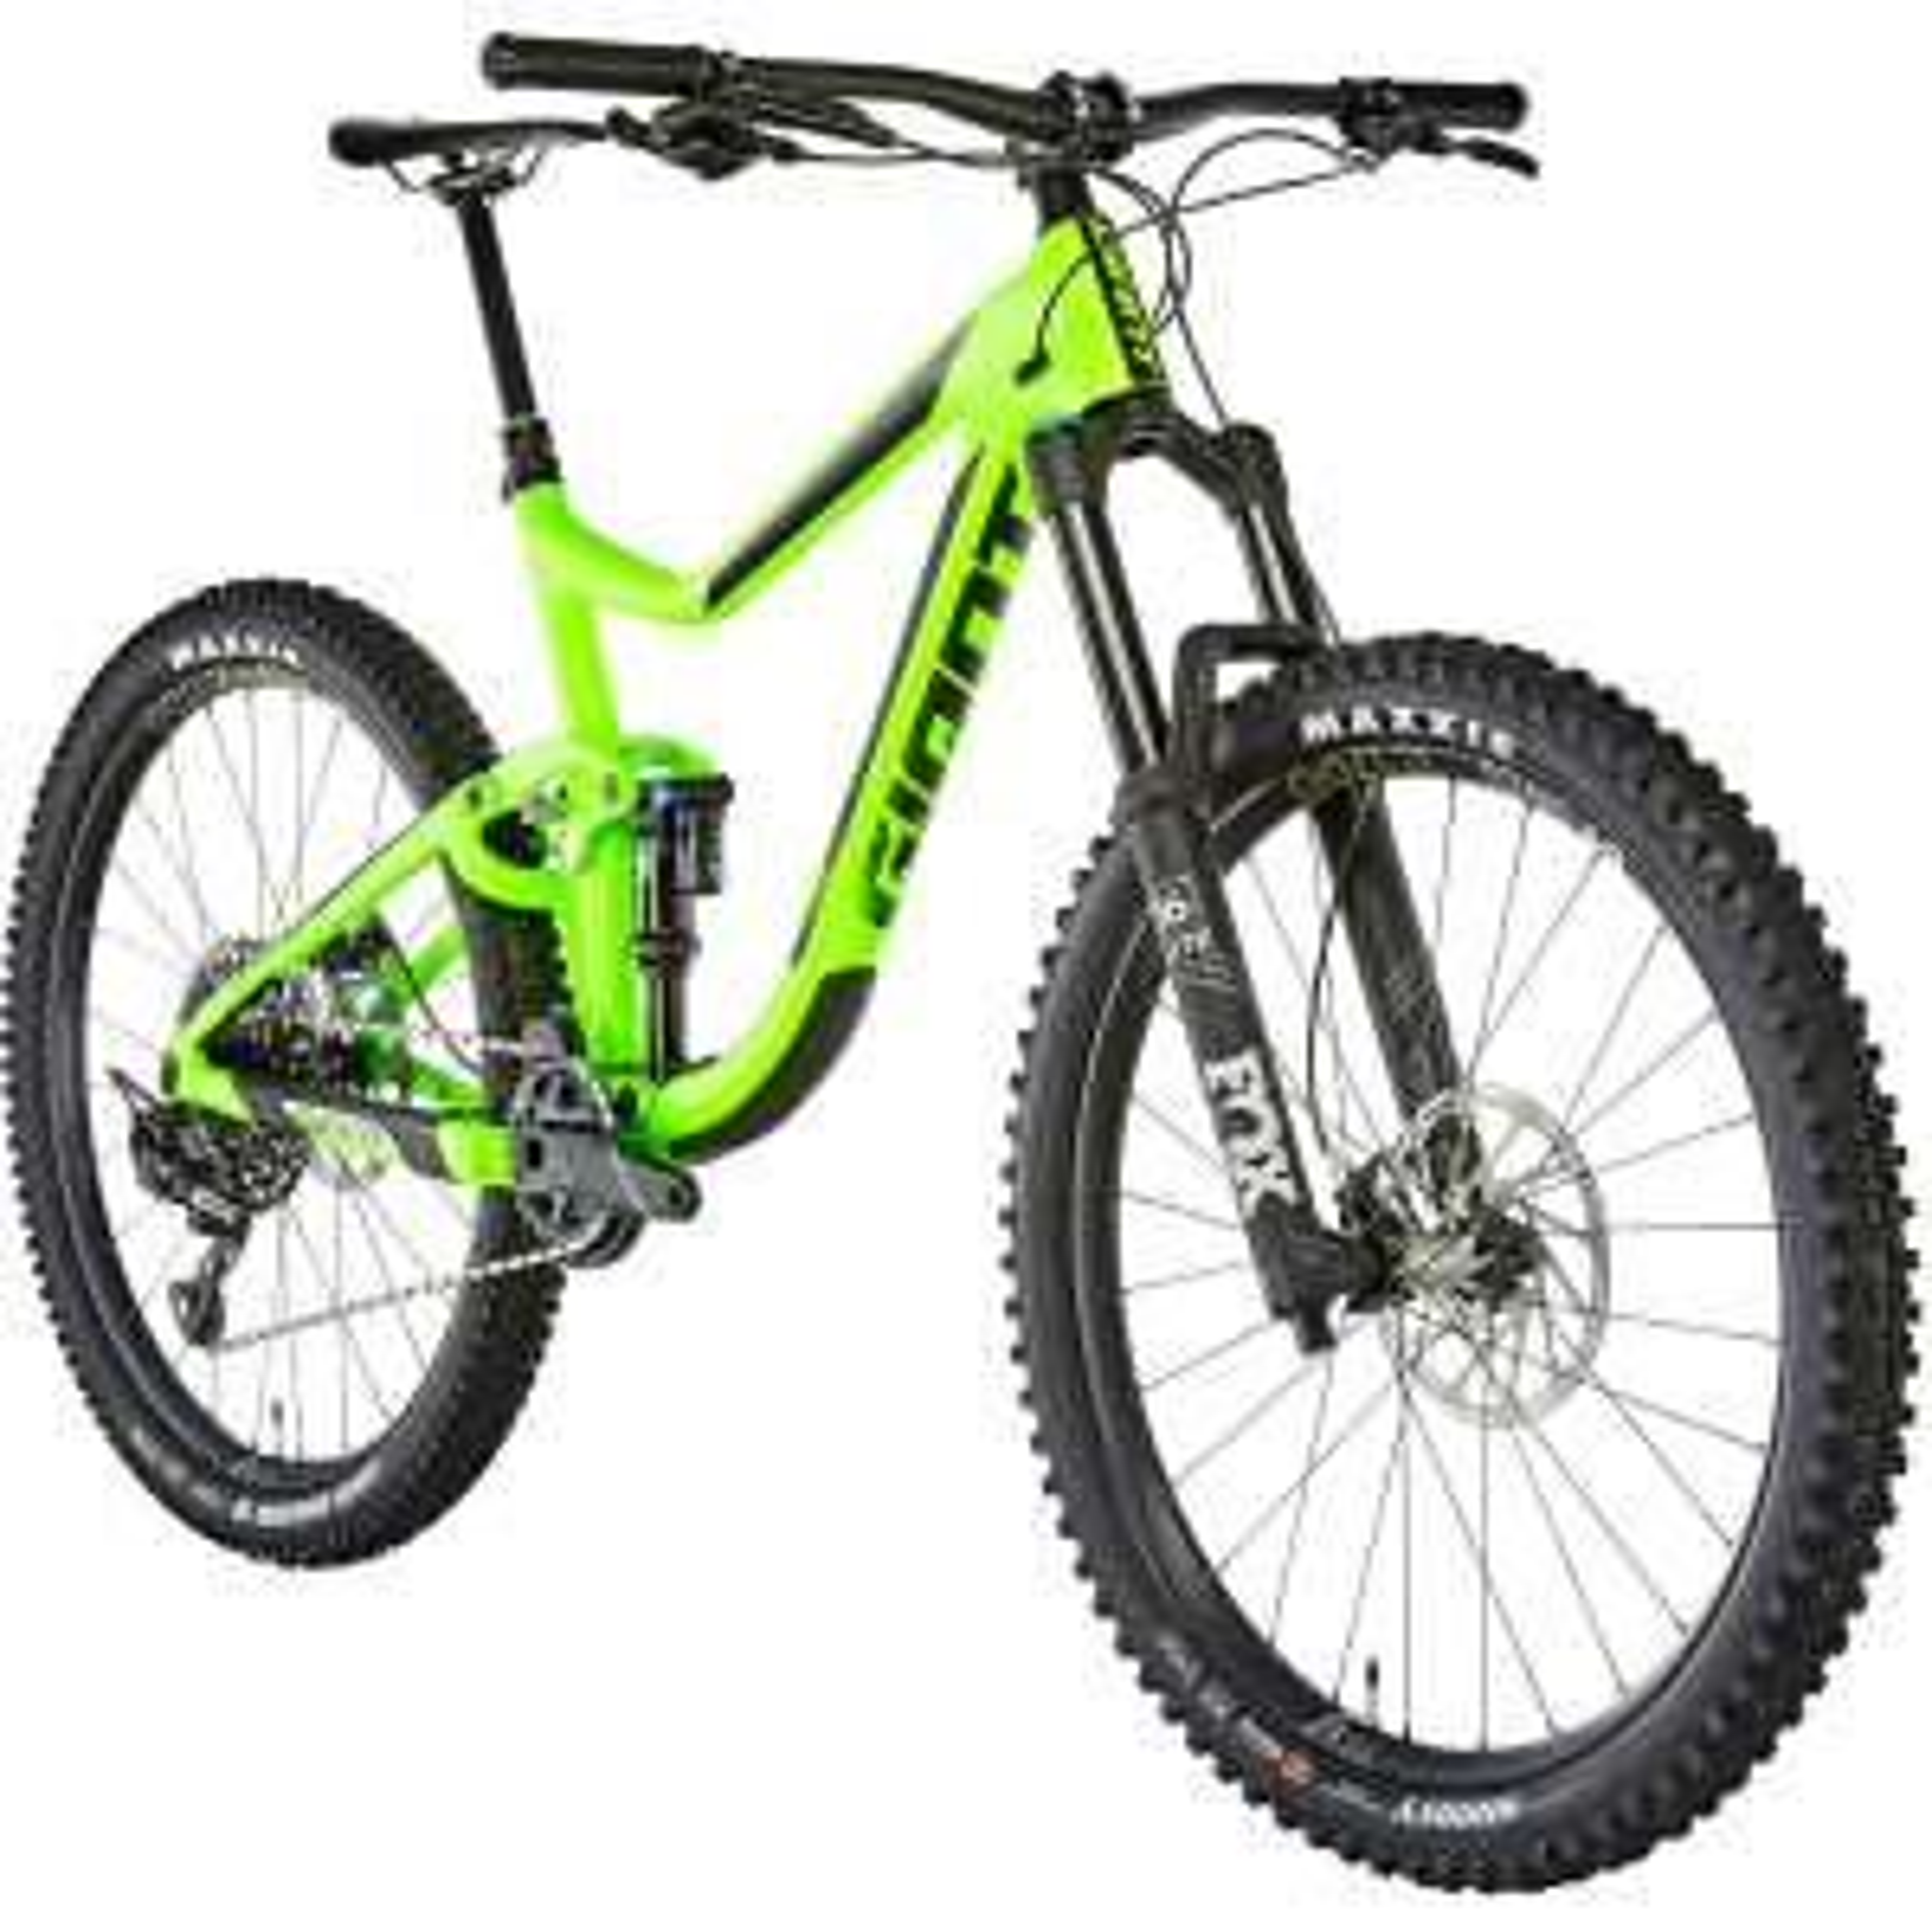 "MTB Fahrrad Giant Reign Advanced 1 27.5"" (Carbon/Eagle GX/Fox 36 Elite/13.46kg) - 2018 (XL)"